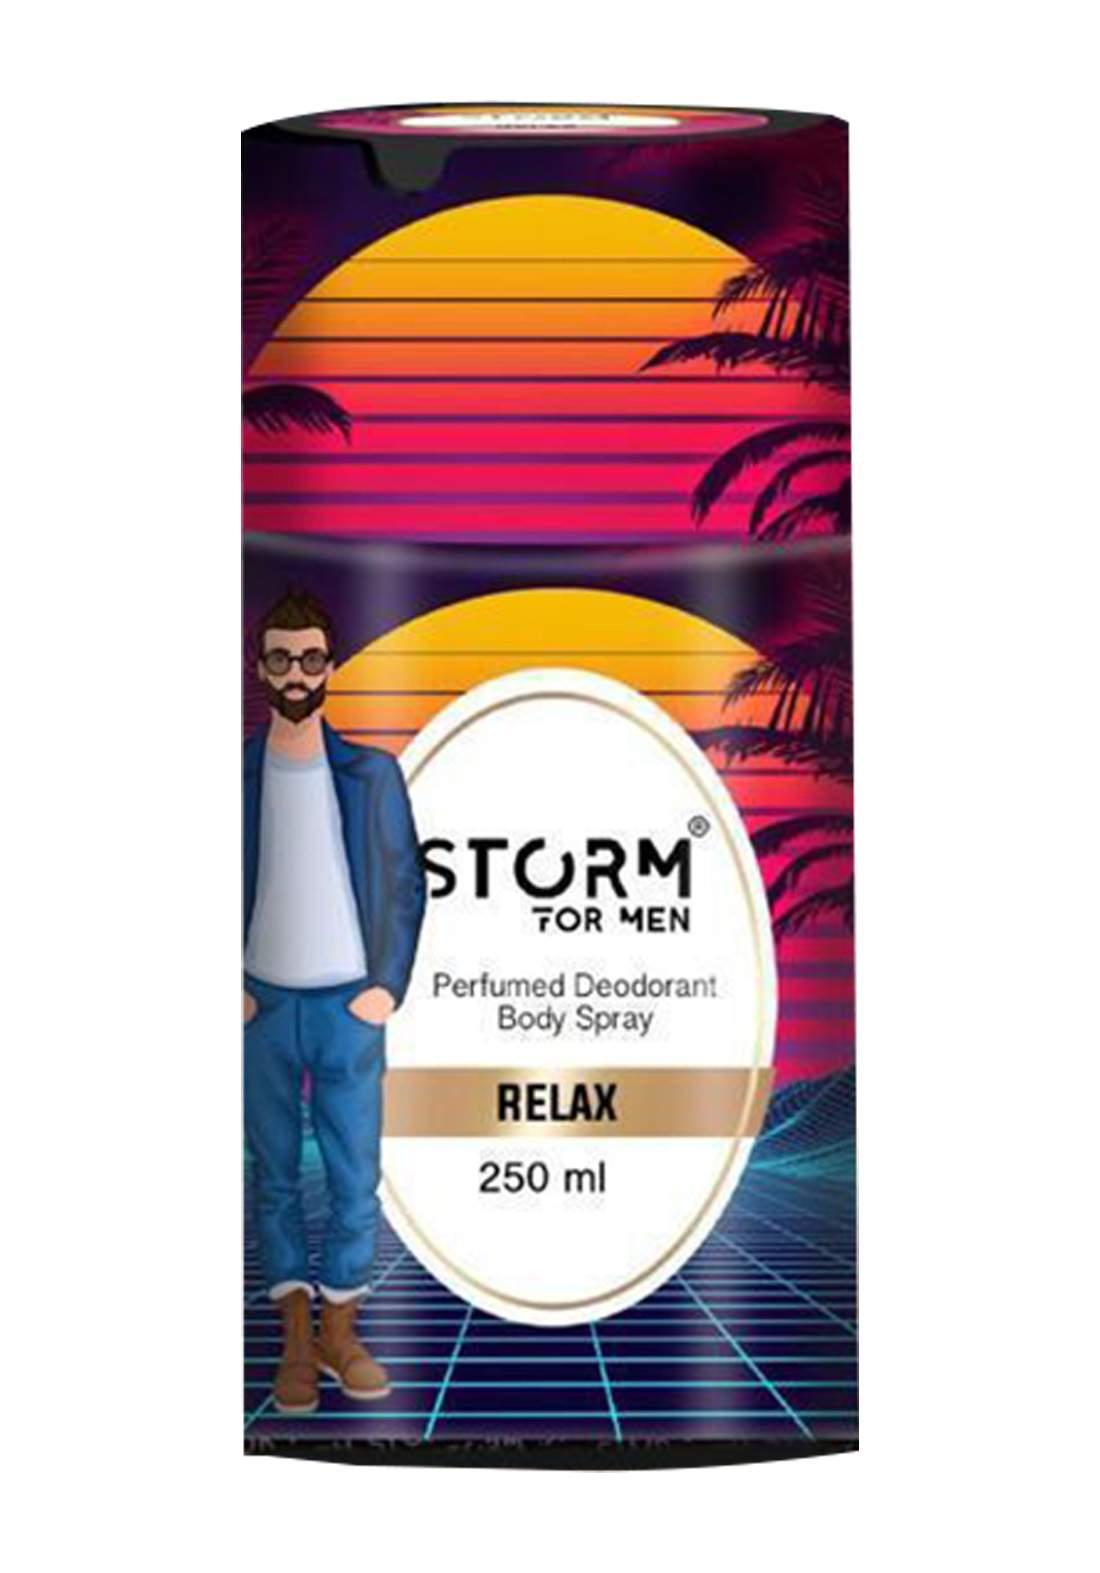 Storm Perfumed Deodorant Body Spray For Men-Relax 250ml معطر جسم رجالي